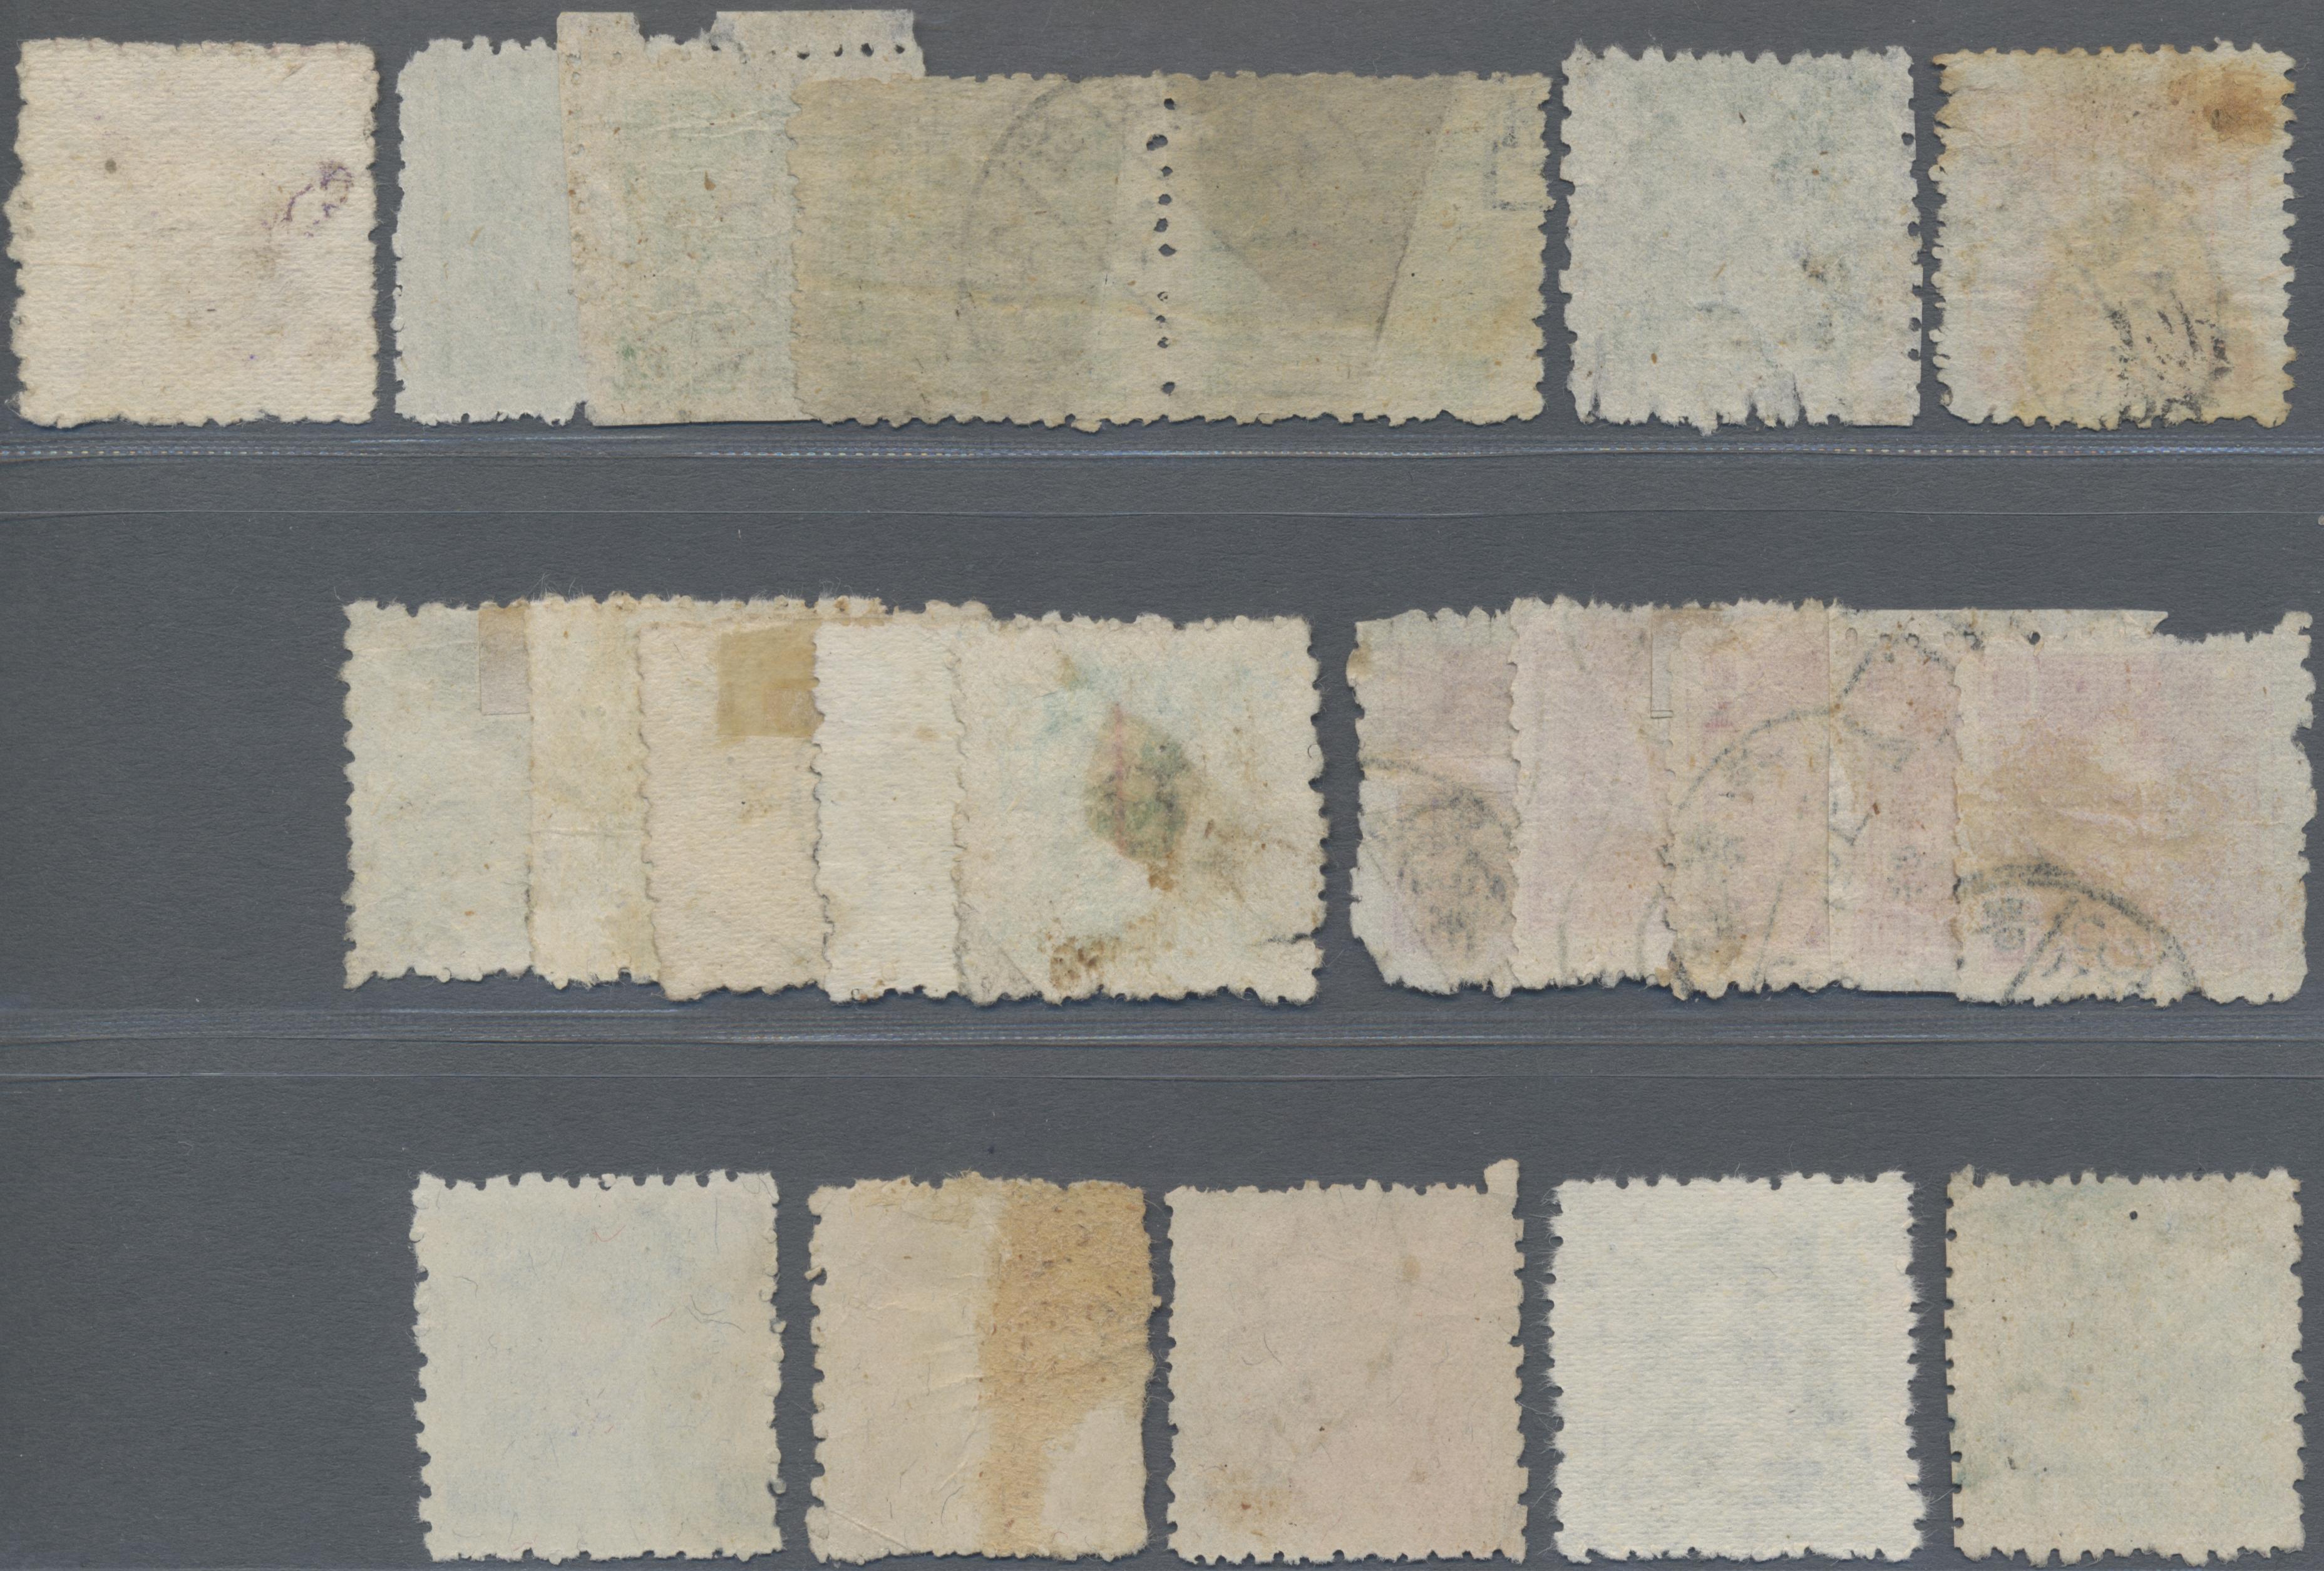 Lot 05507 - China - Volksrepublik - Provinzen  -  Auktionshaus Christoph Gärtner GmbH & Co. KG Sale #45- Special Auction China